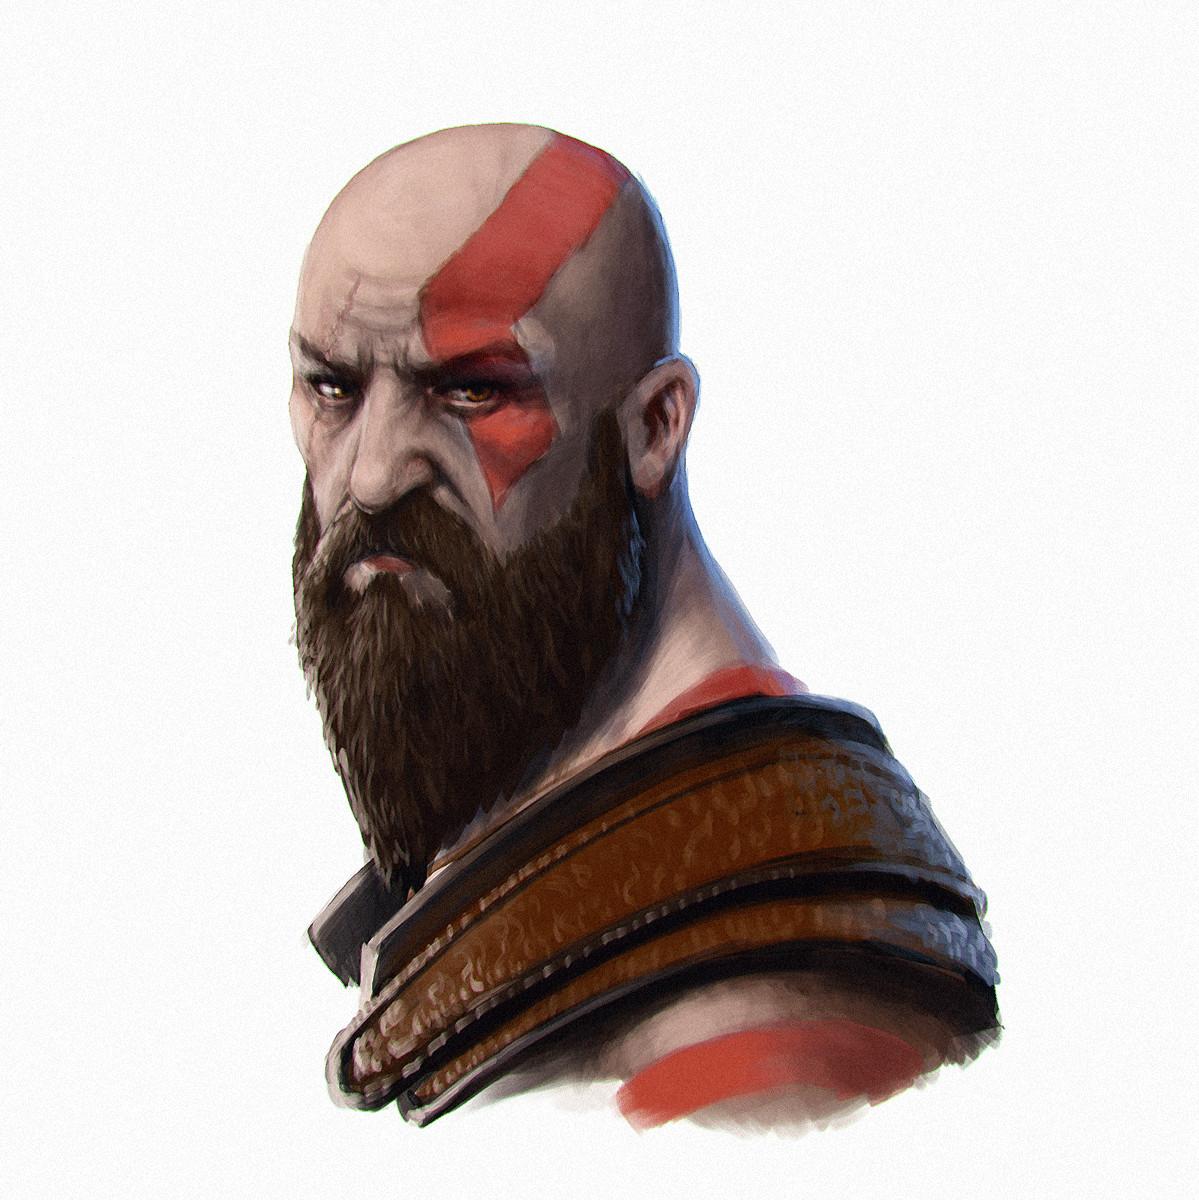 Giuseppe de iure kratos dig web